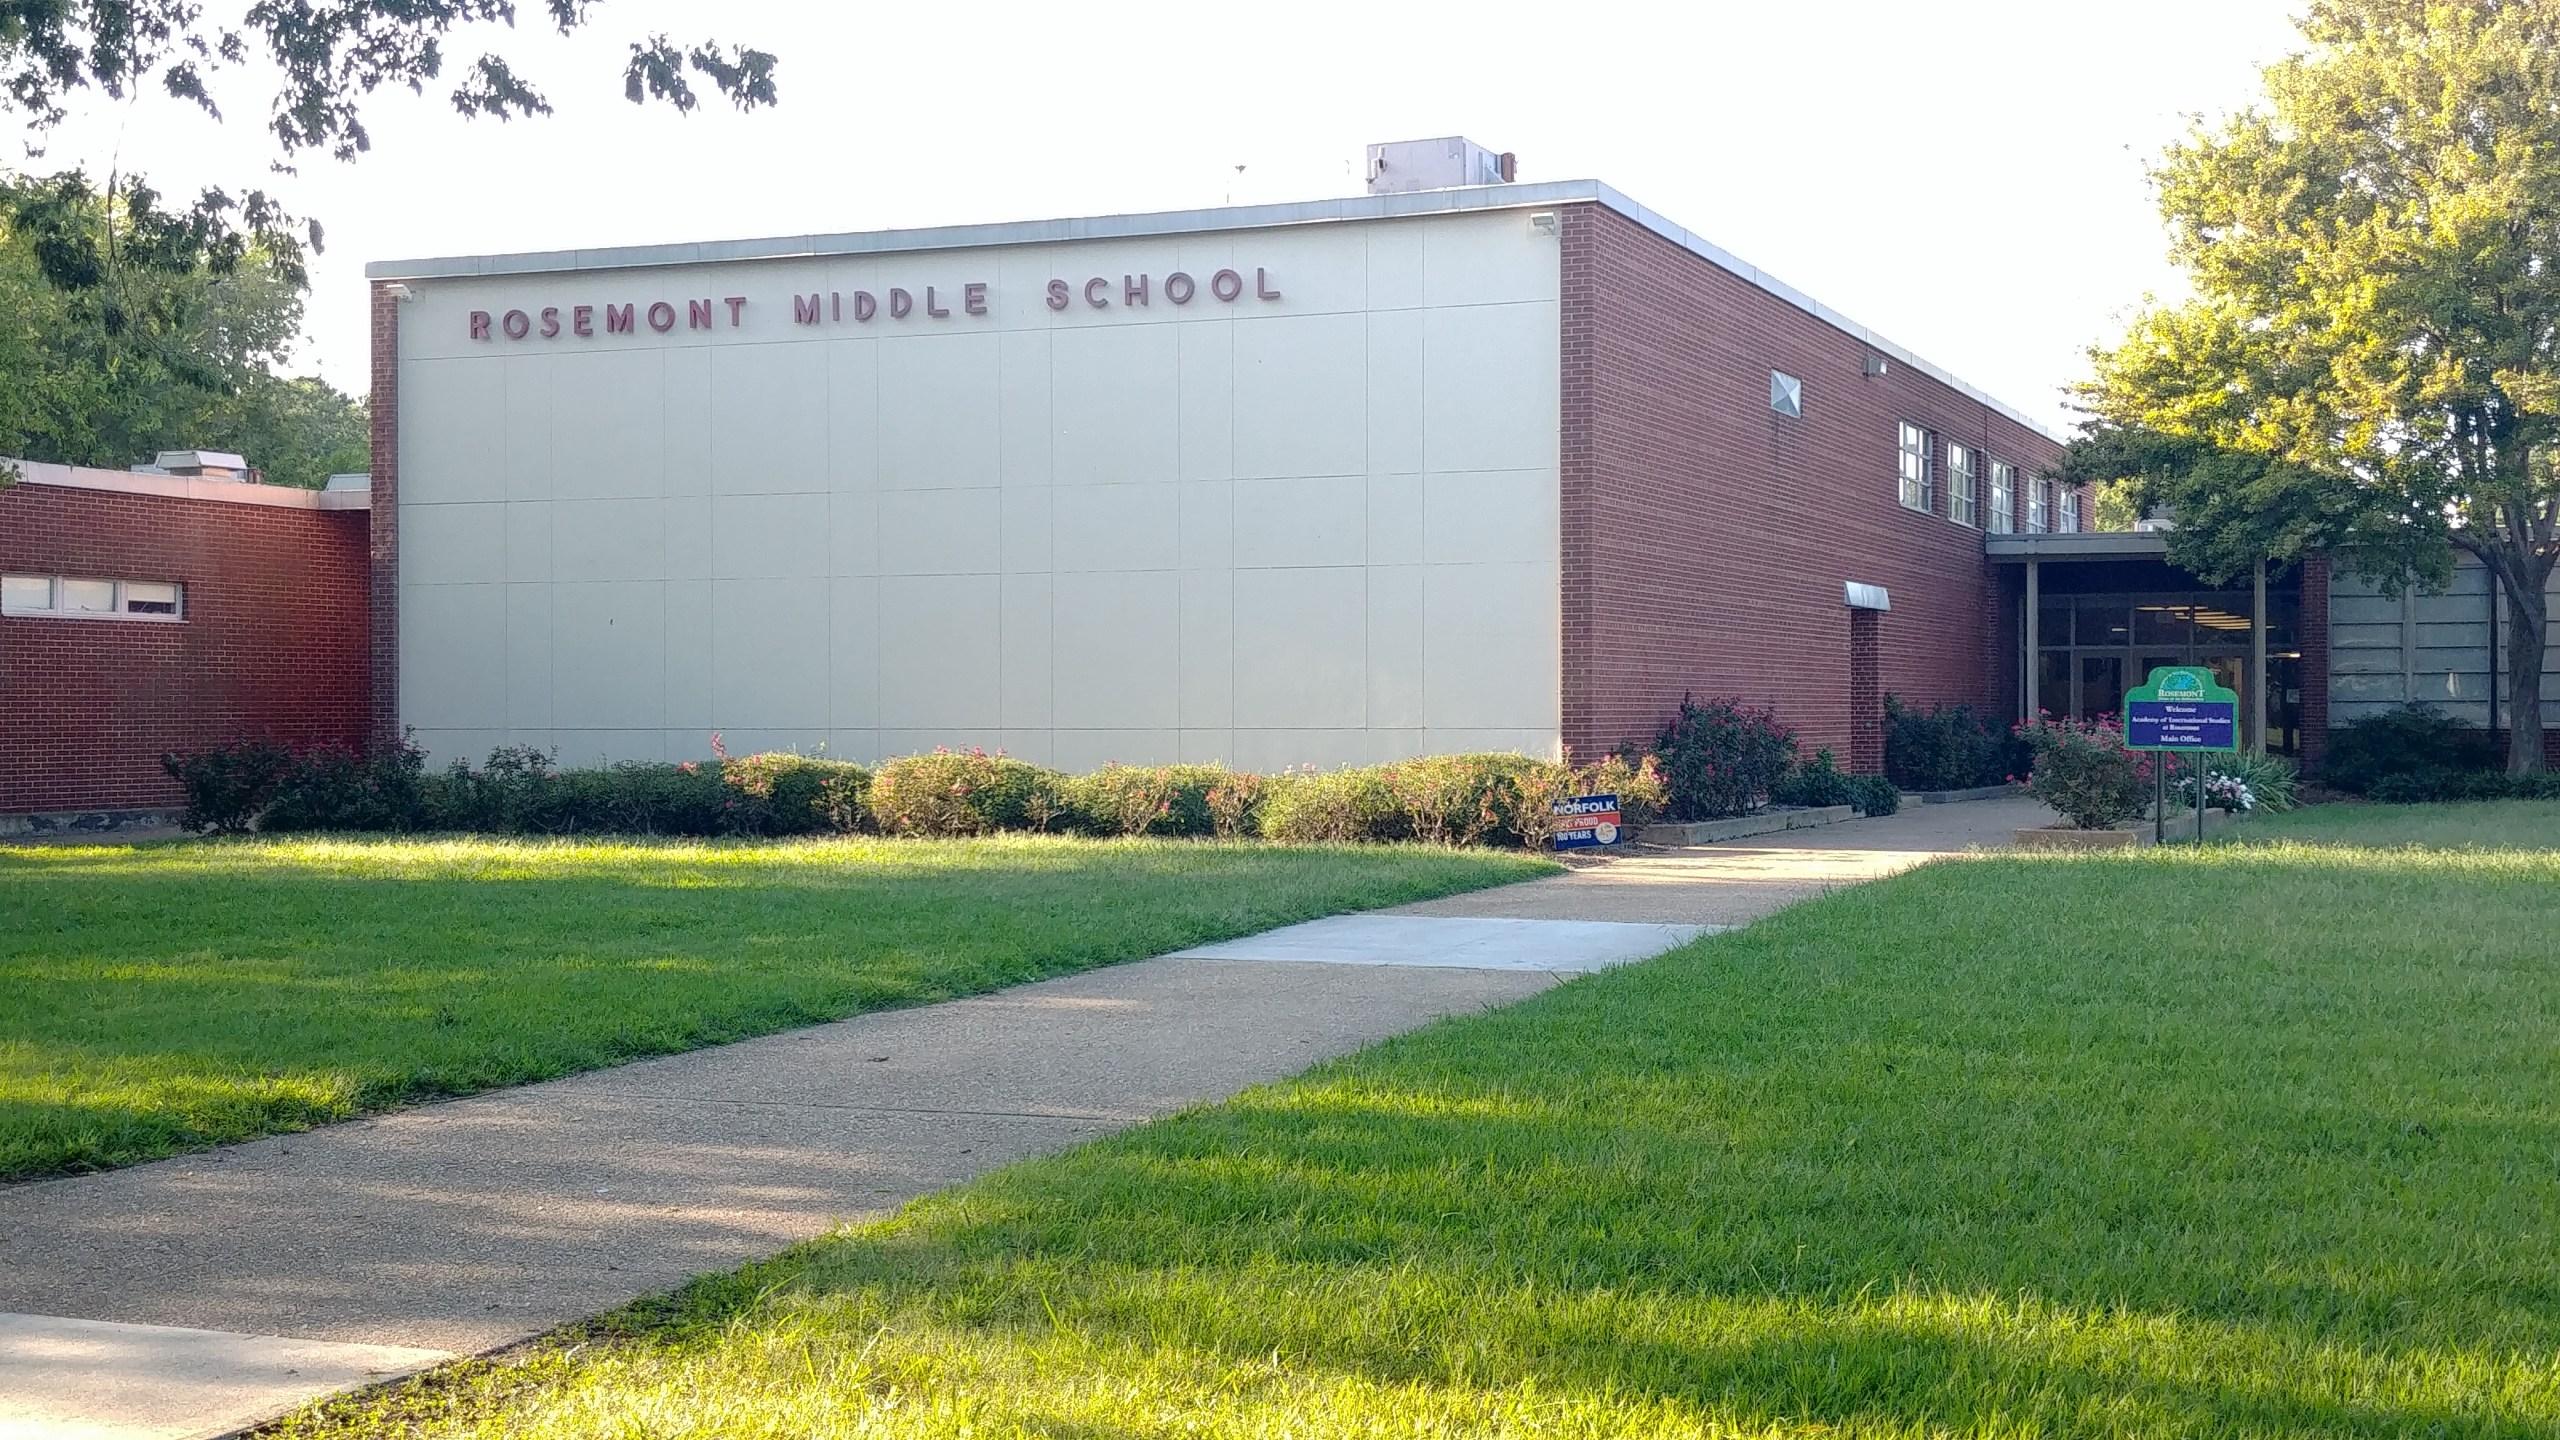 Rosemont Middle School Generic Norfolk School Generic4.jpg